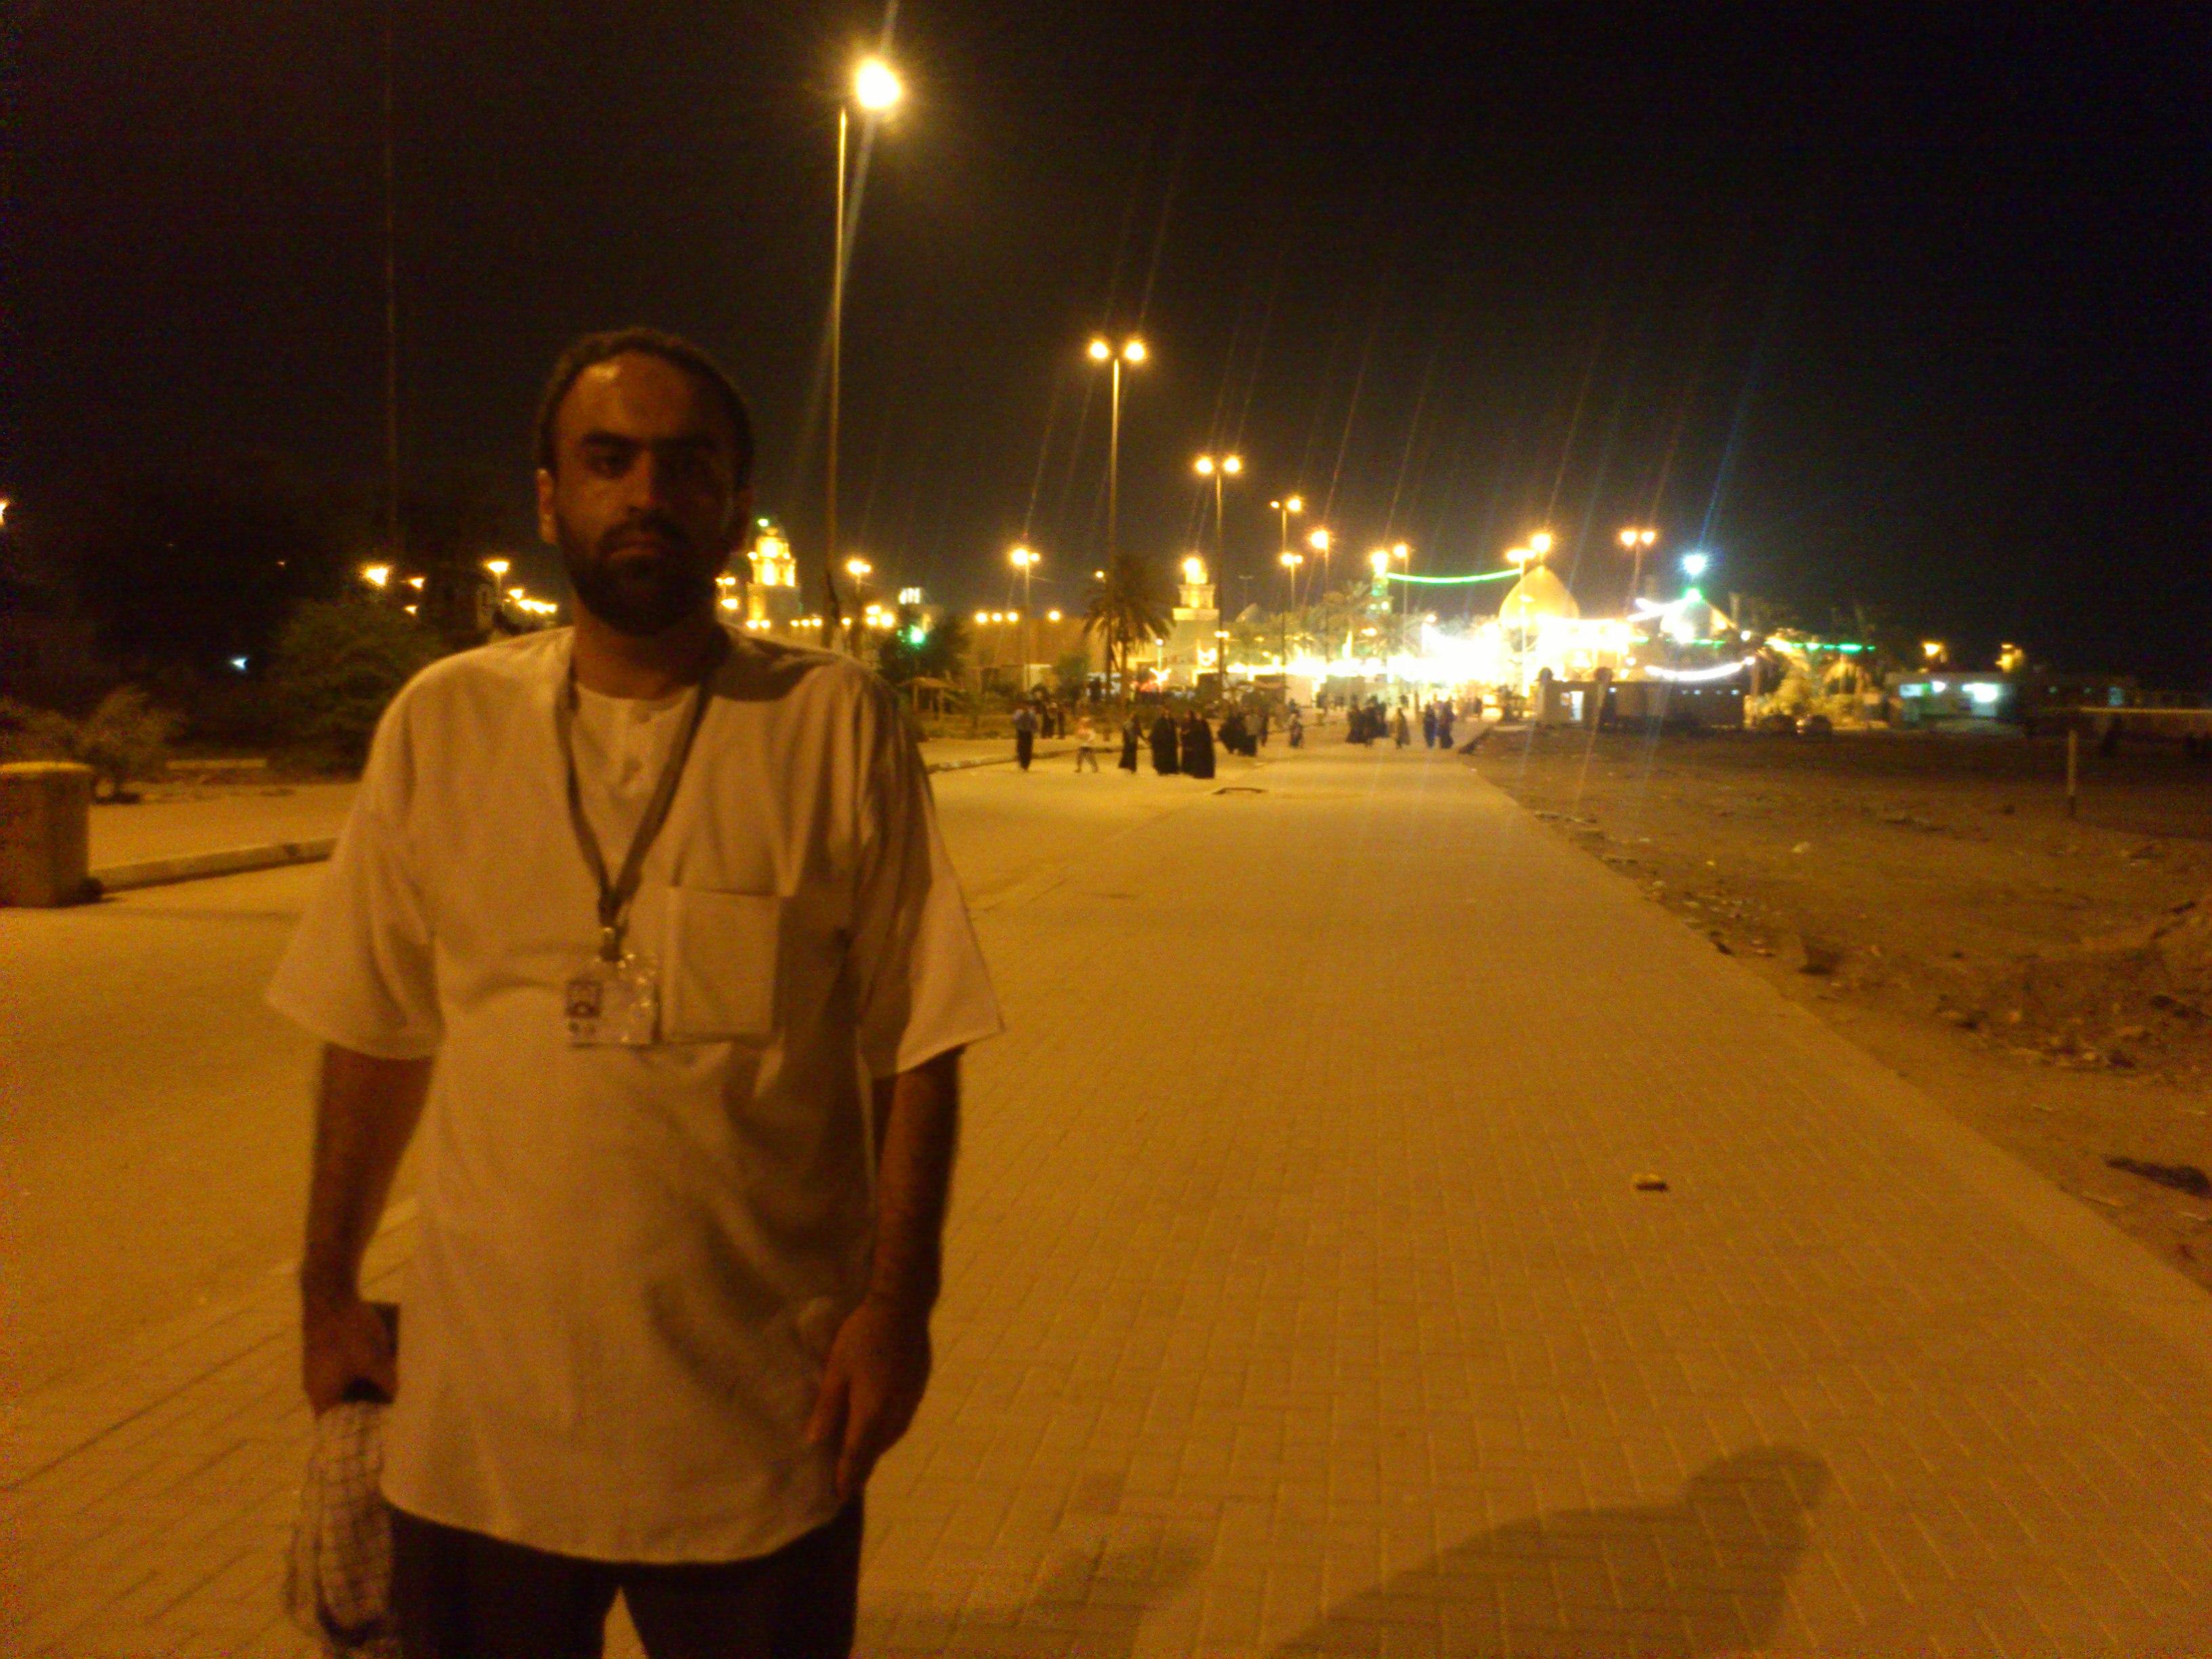 زیارت مسجد کوفه .... رضا شکری